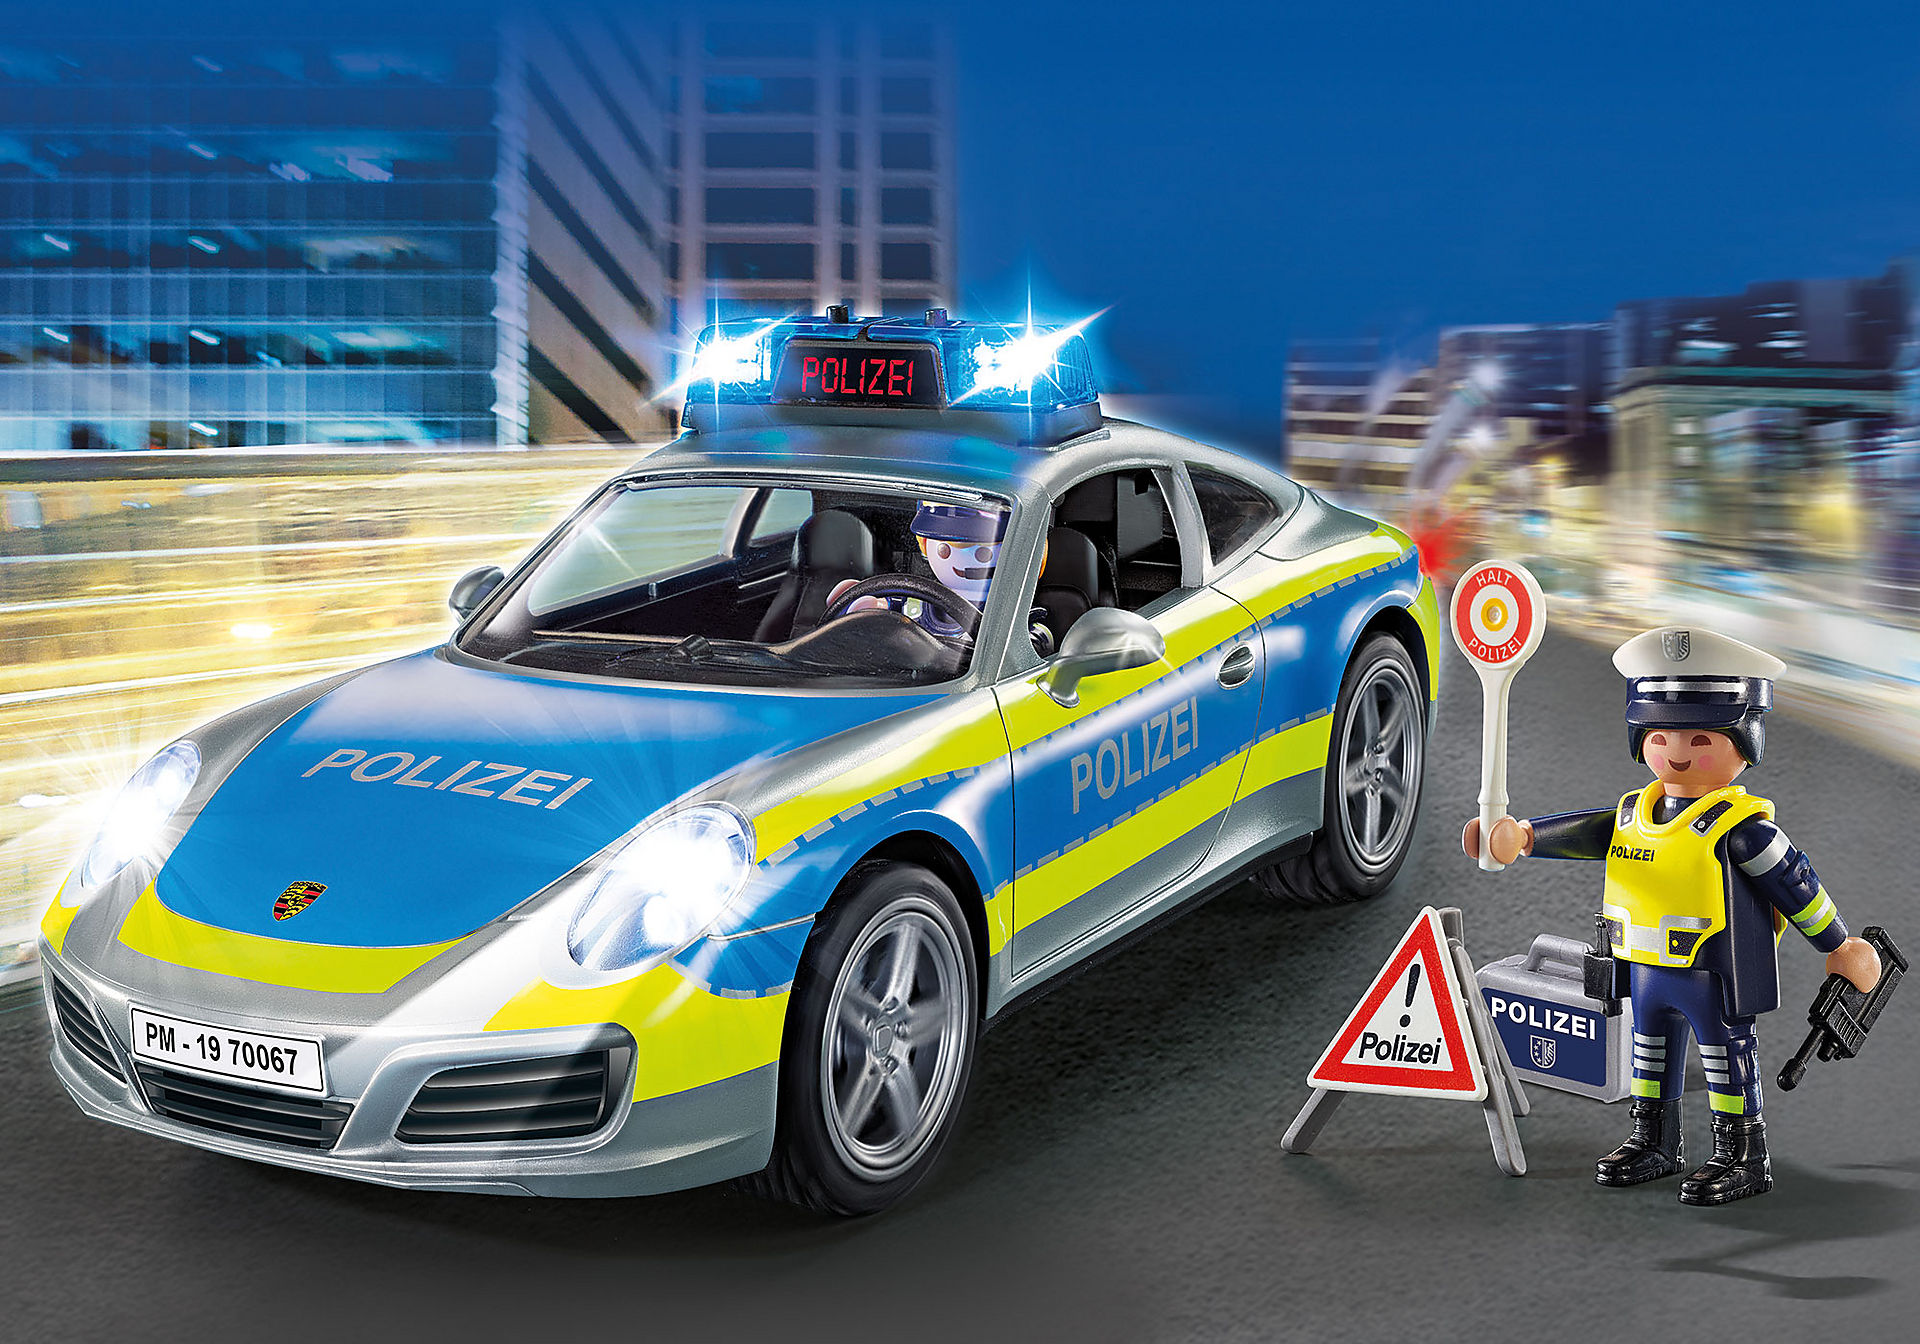 70067 Porsche 911 Carrera 4S Polizei zoom image1